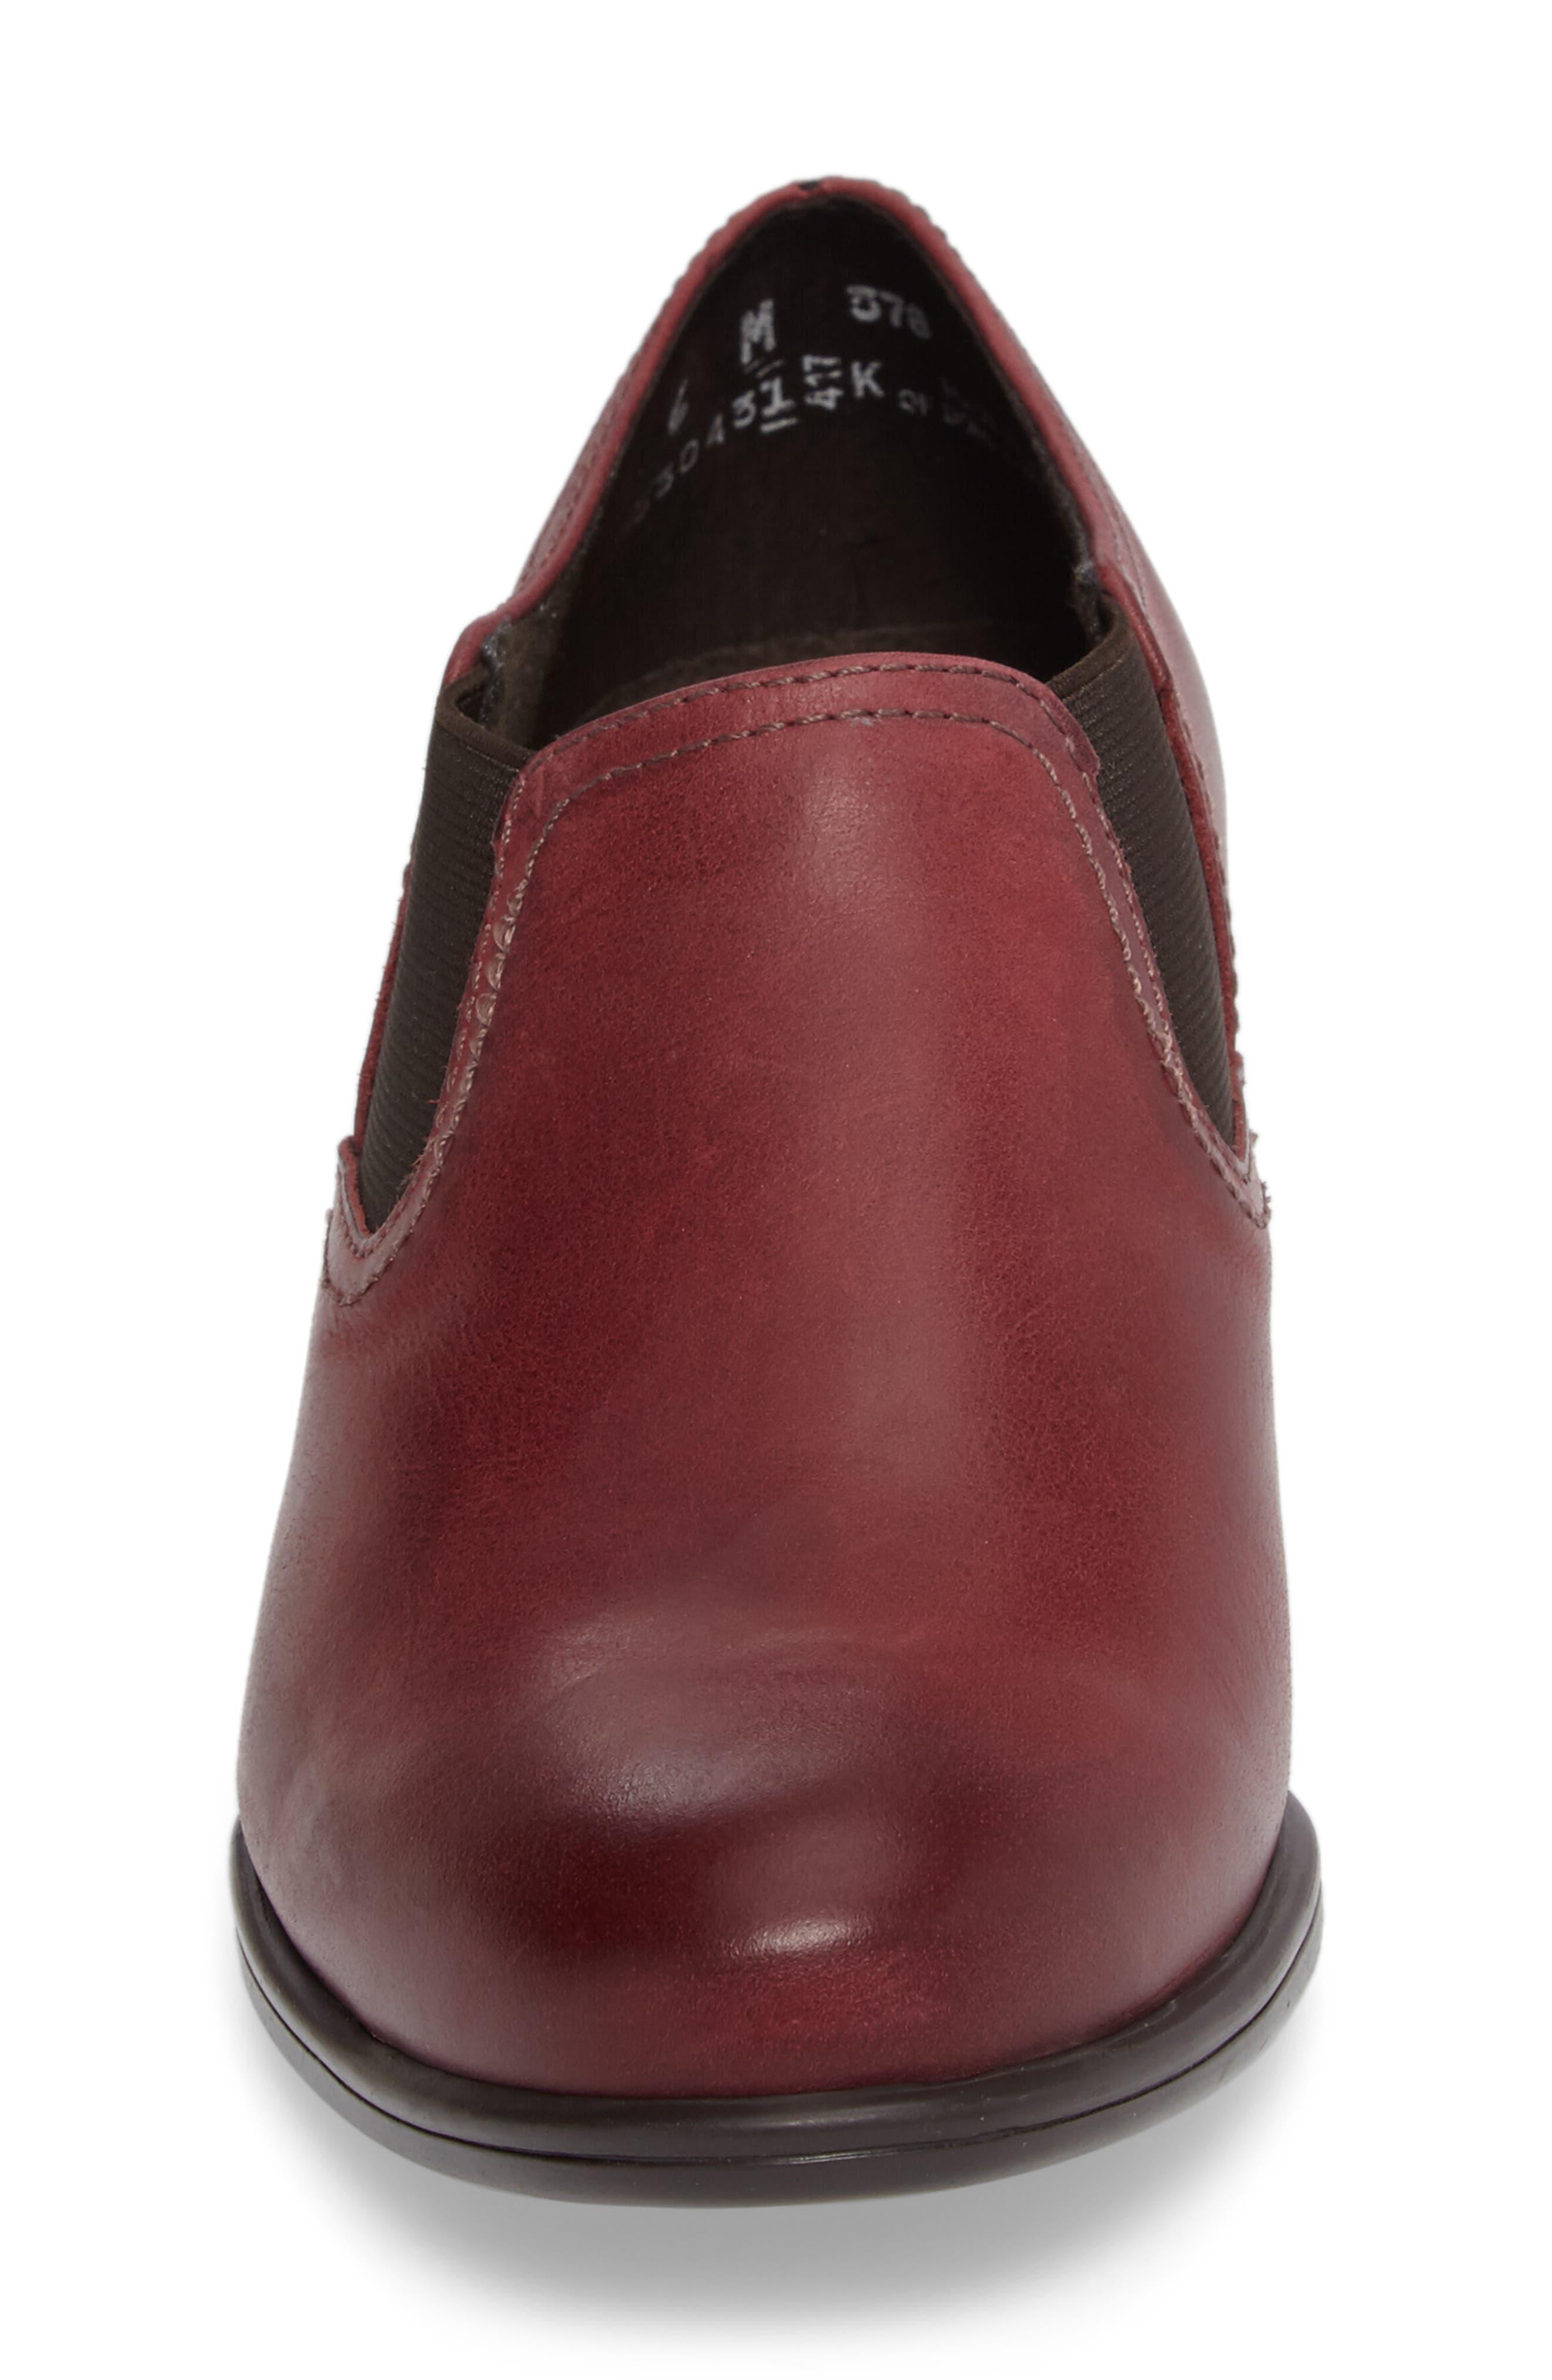 Frisco Bootie,                             Alternate thumbnail 4, color,                             Wine Leather